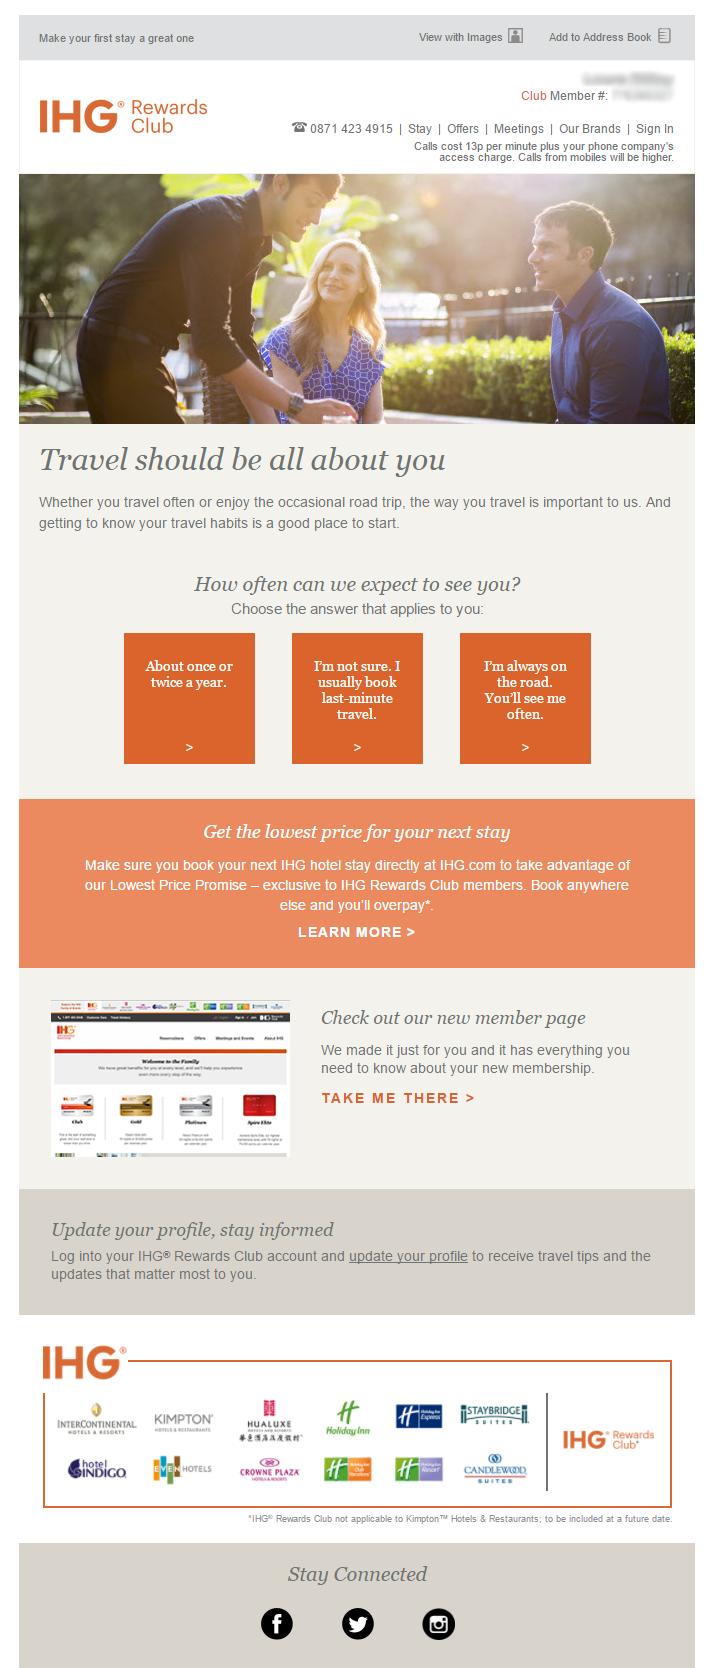 Survey Email from IHG Rewards Club #EmailMarketing #Email #Marketing